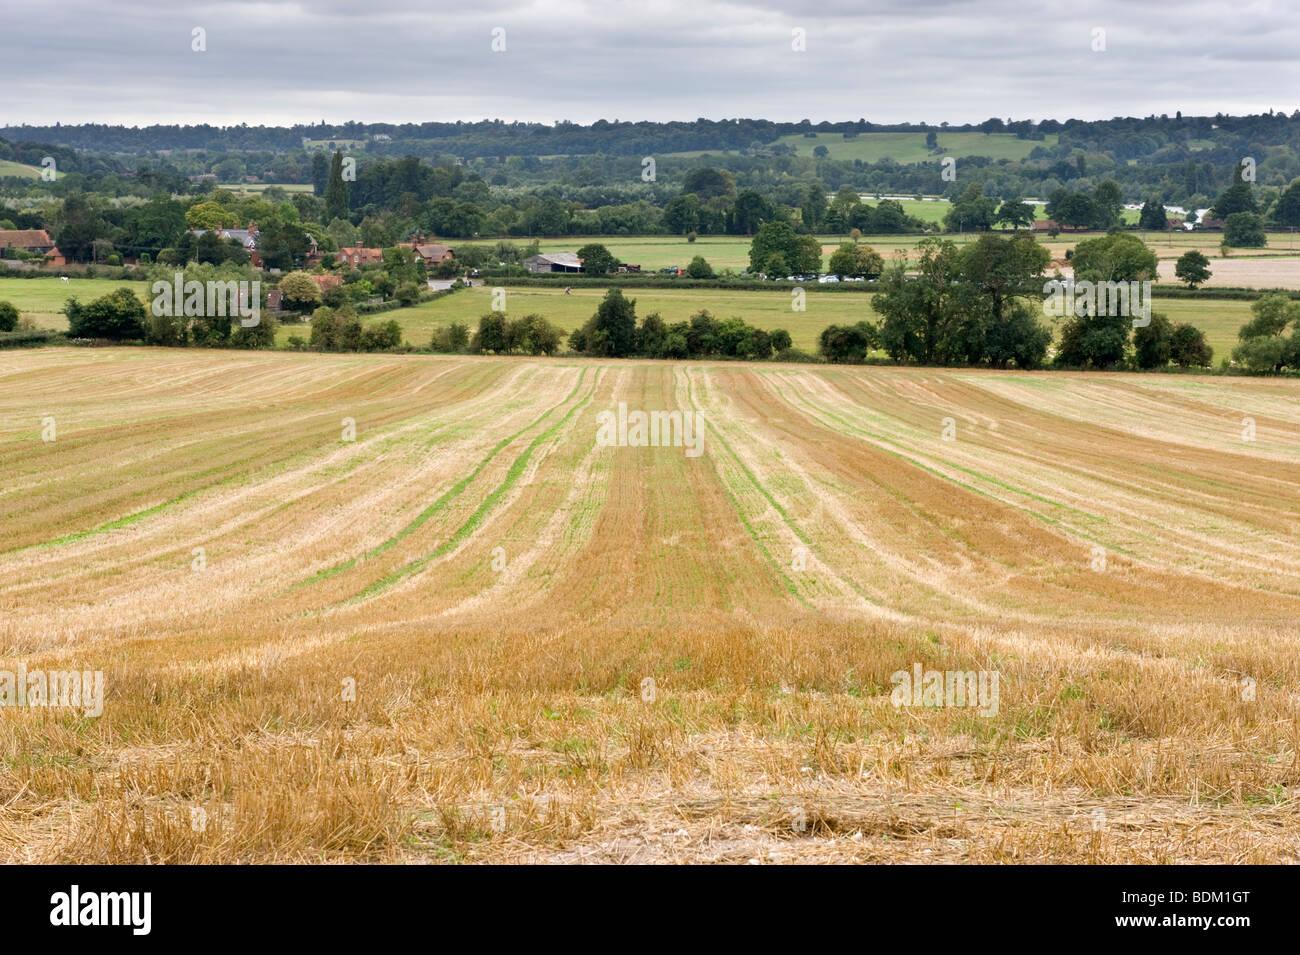 Open countryside and farmland in a Chilterns landscape near Hambleden, Buckinghamshire, UK - Stock Image